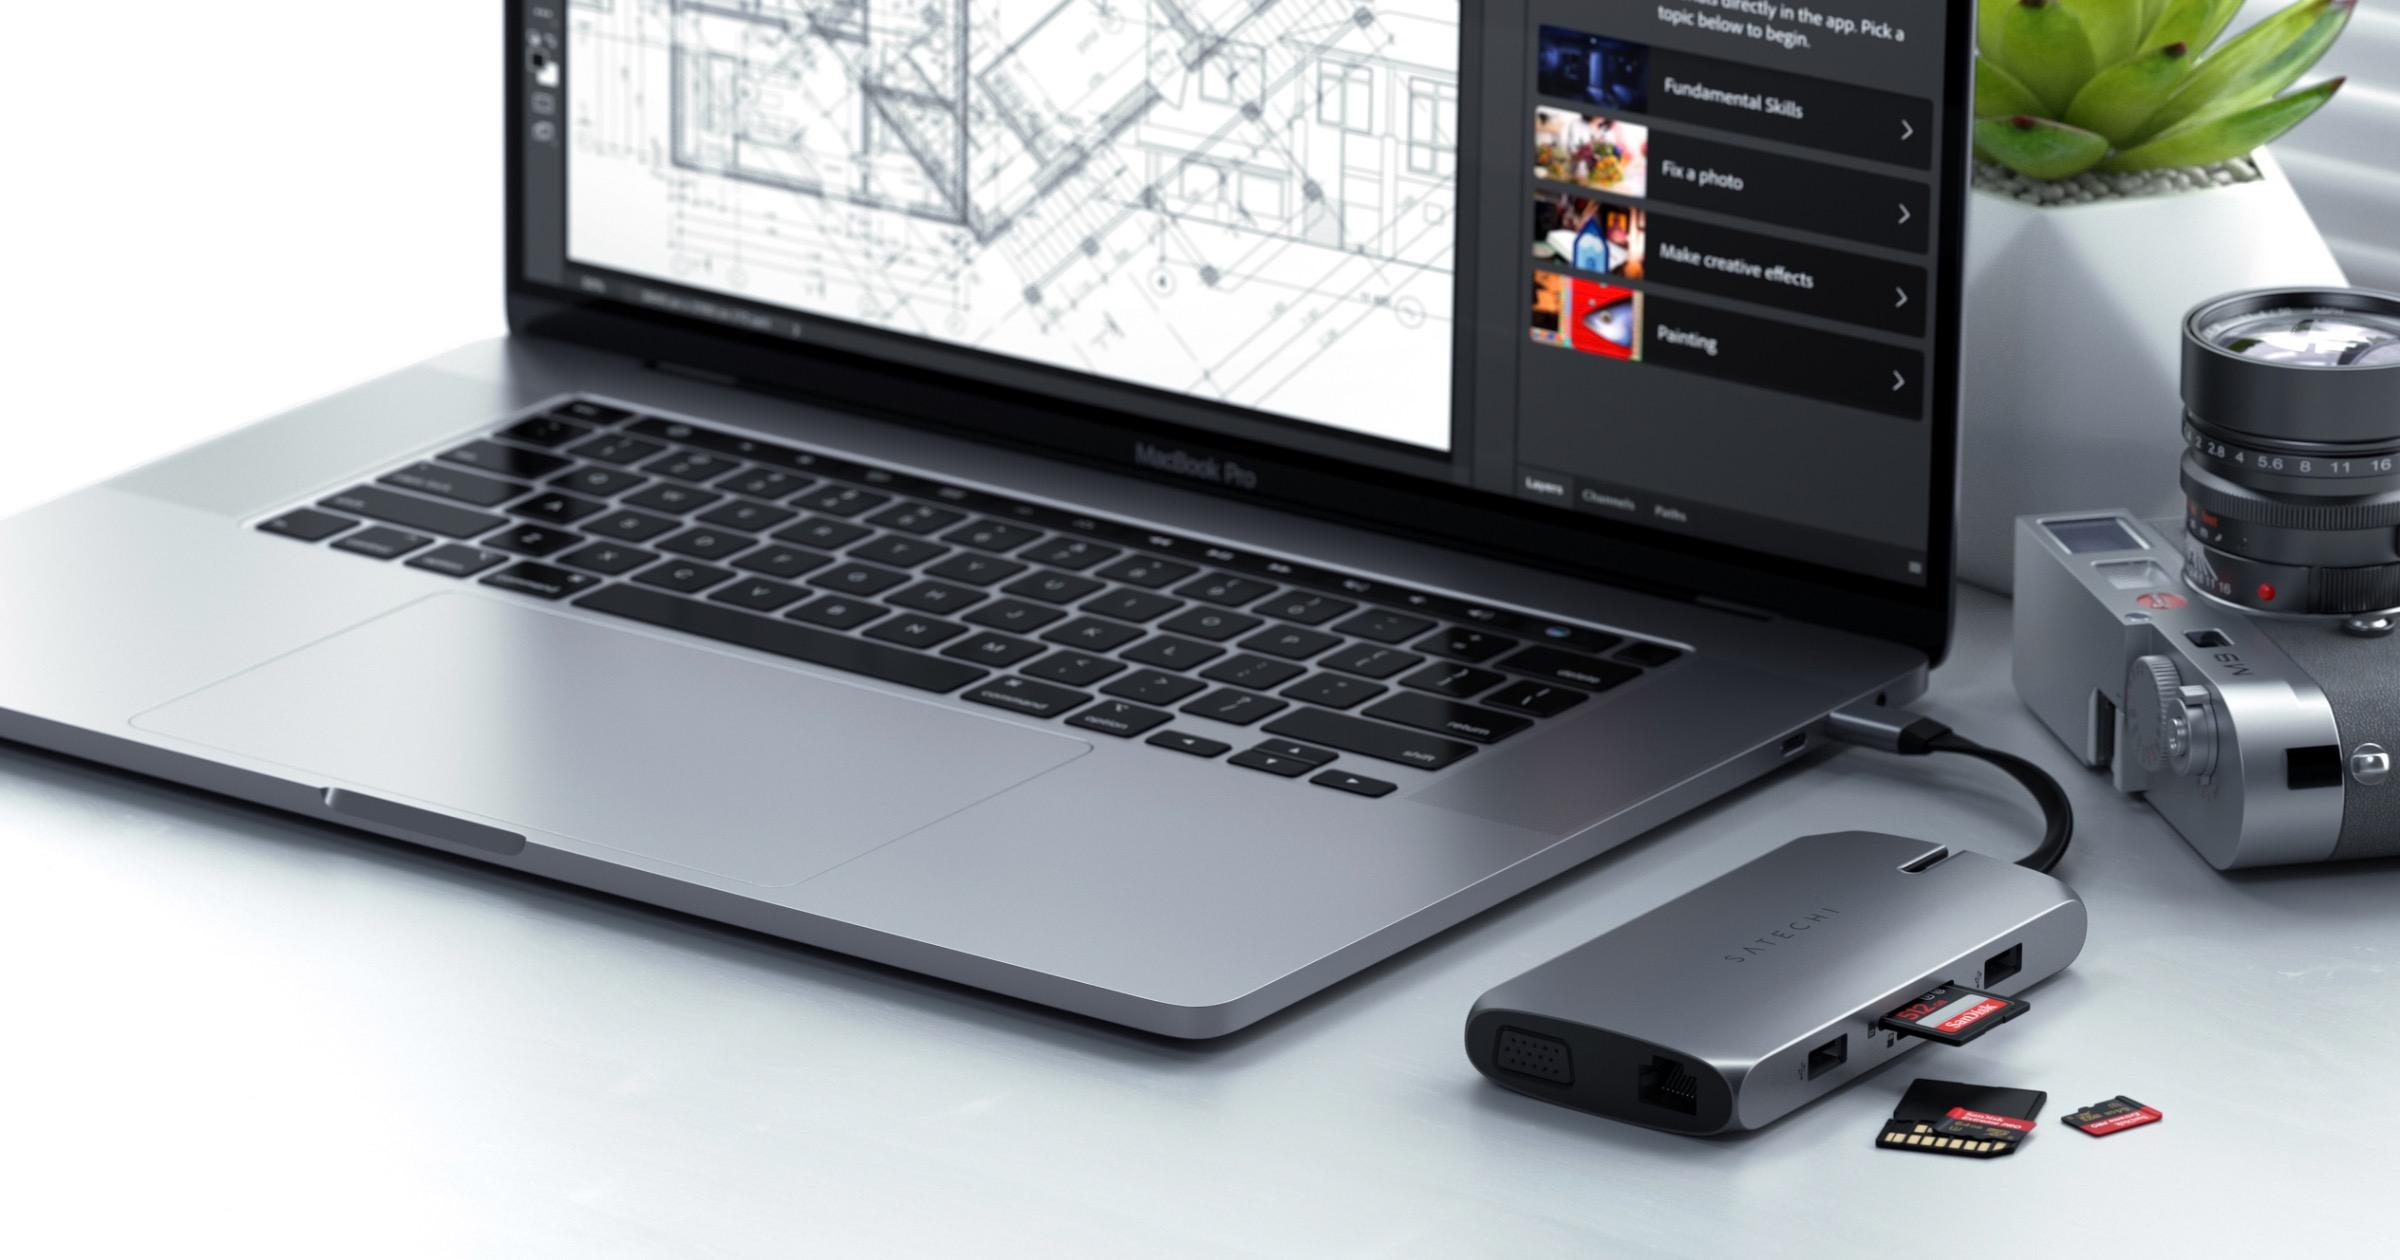 Satechi Releases USB-C Multi-Port Adapter